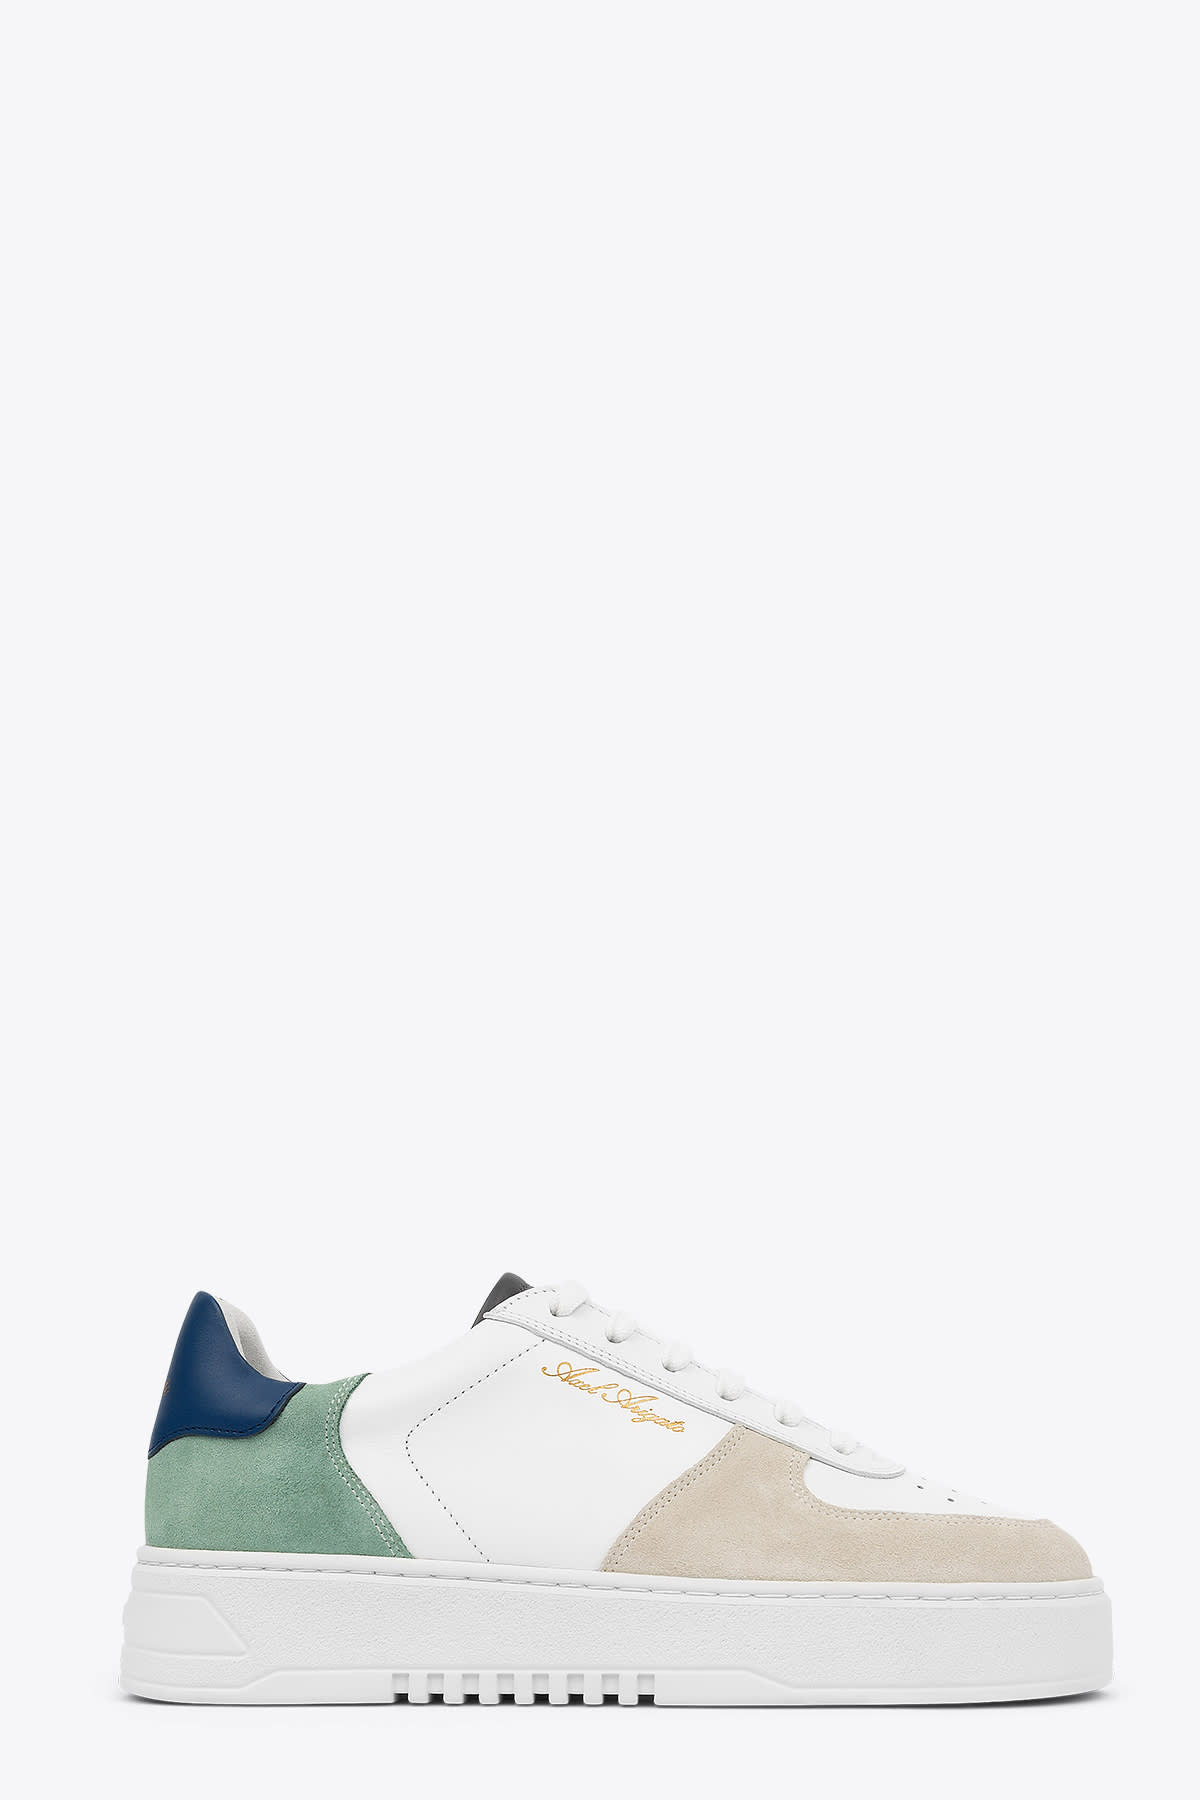 Axel Arigato Orbit Sneakers